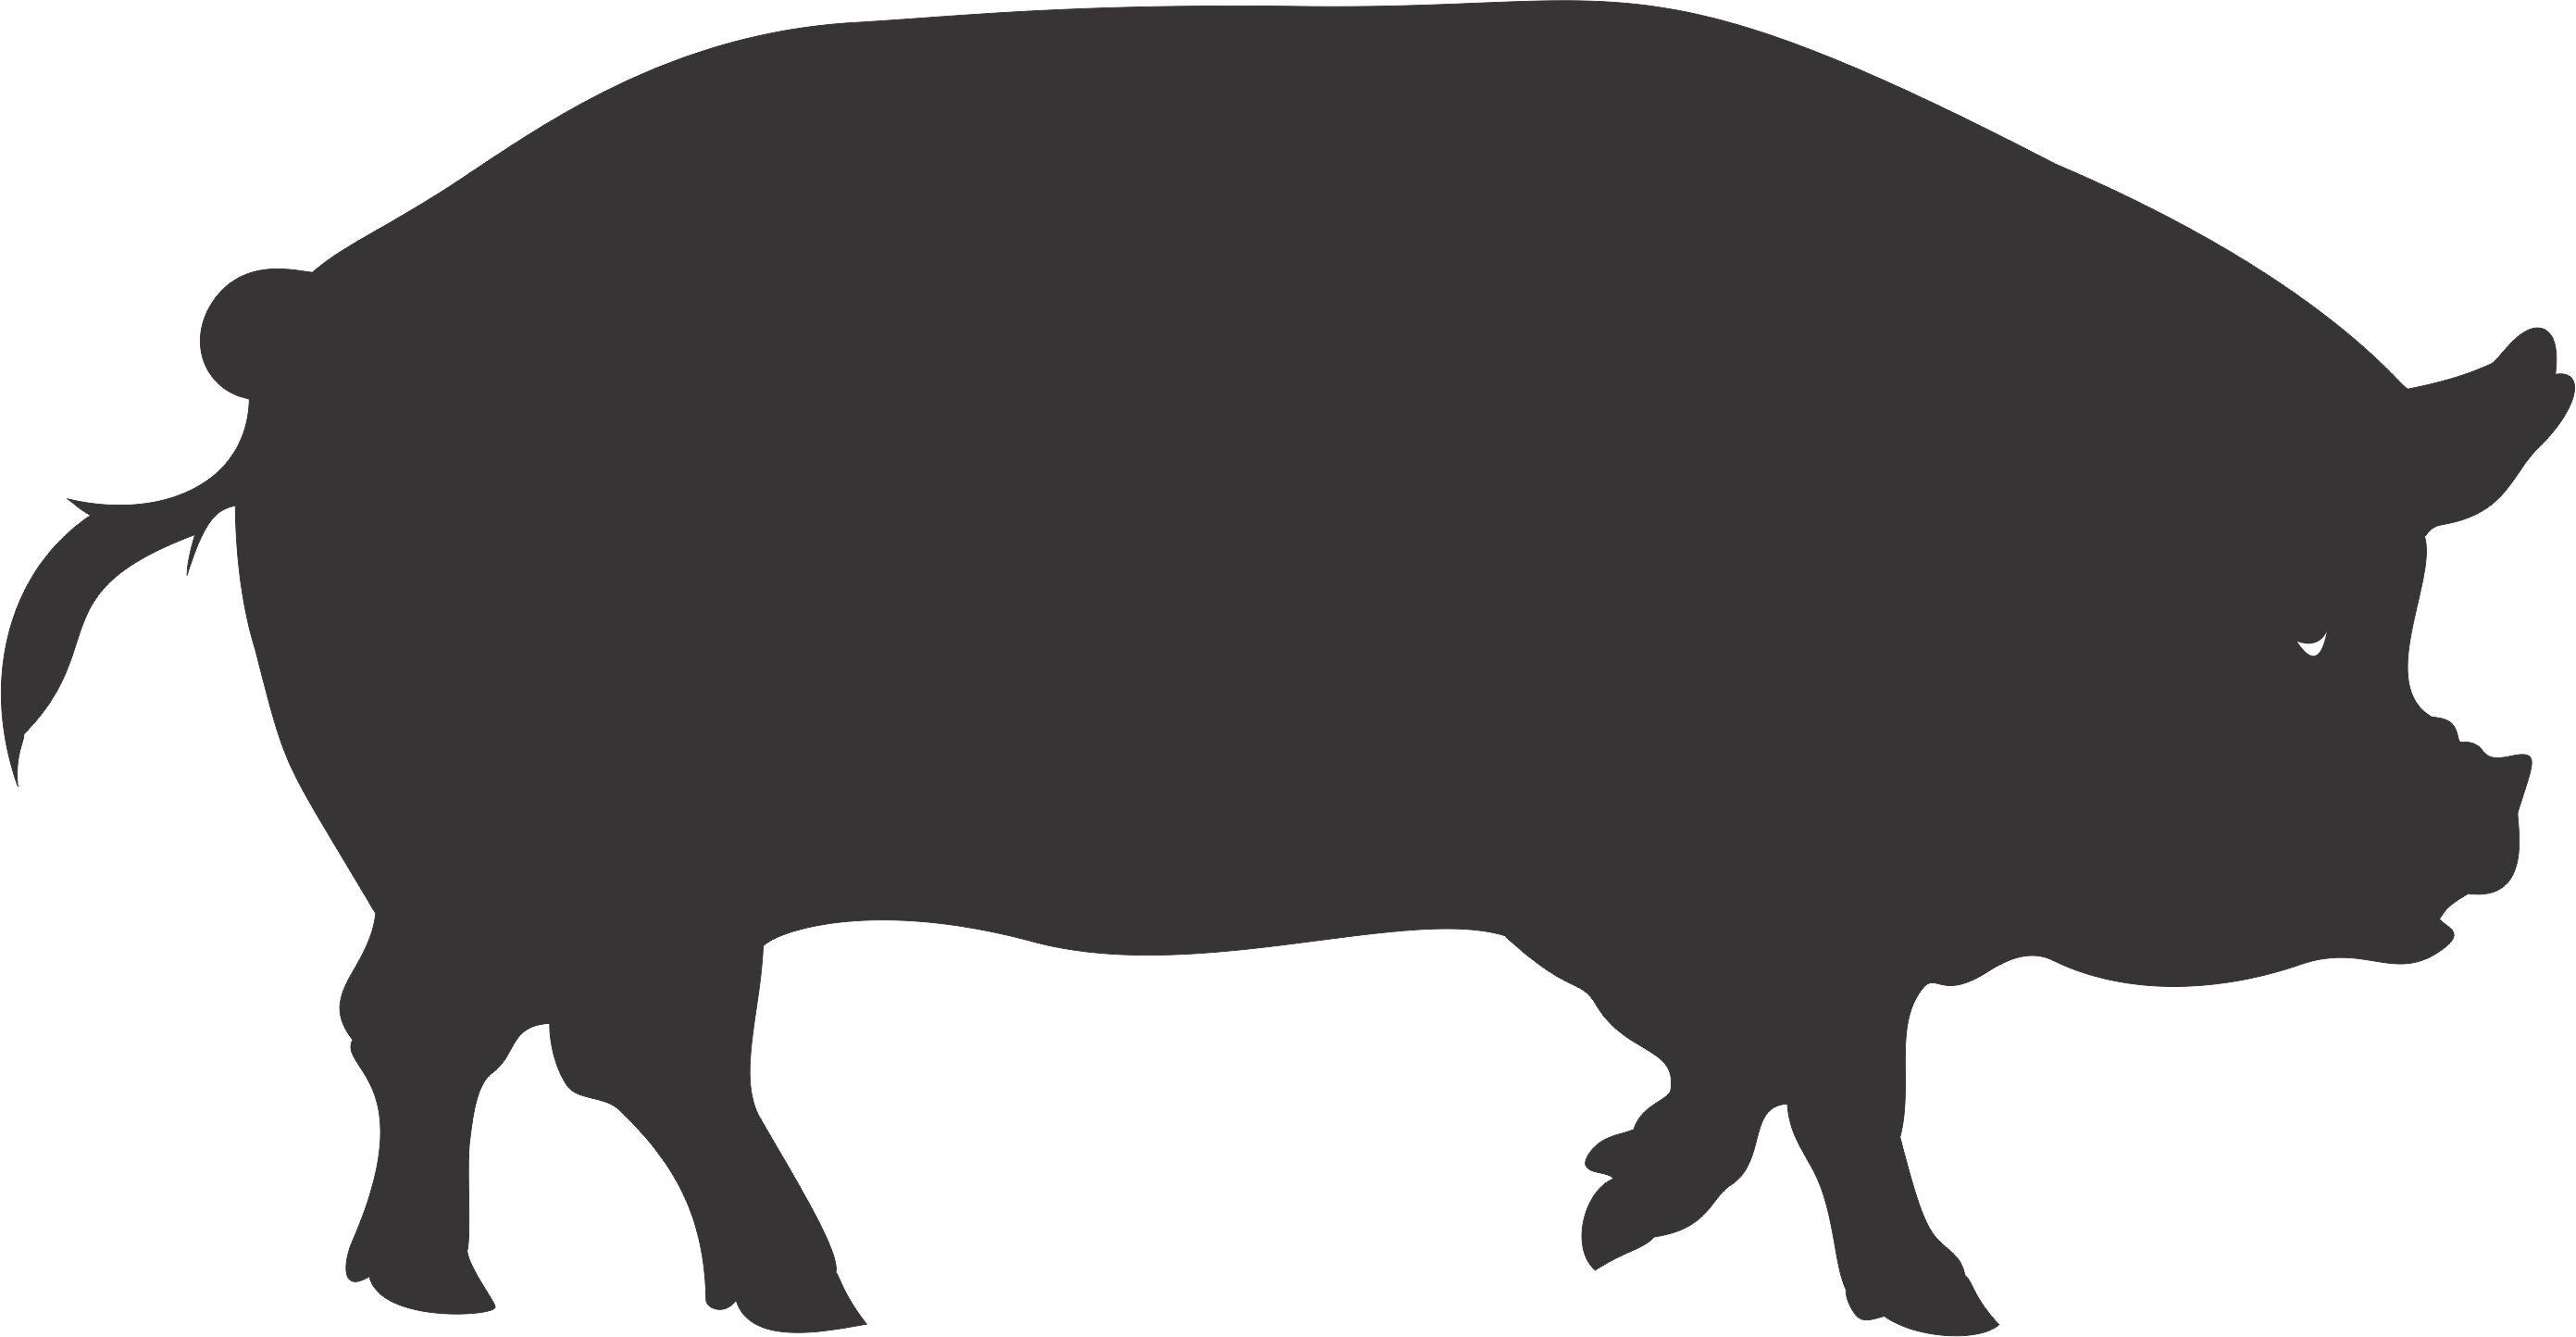 Pig Silhouette Pig Silhouette Pig Cartoon Cartoon